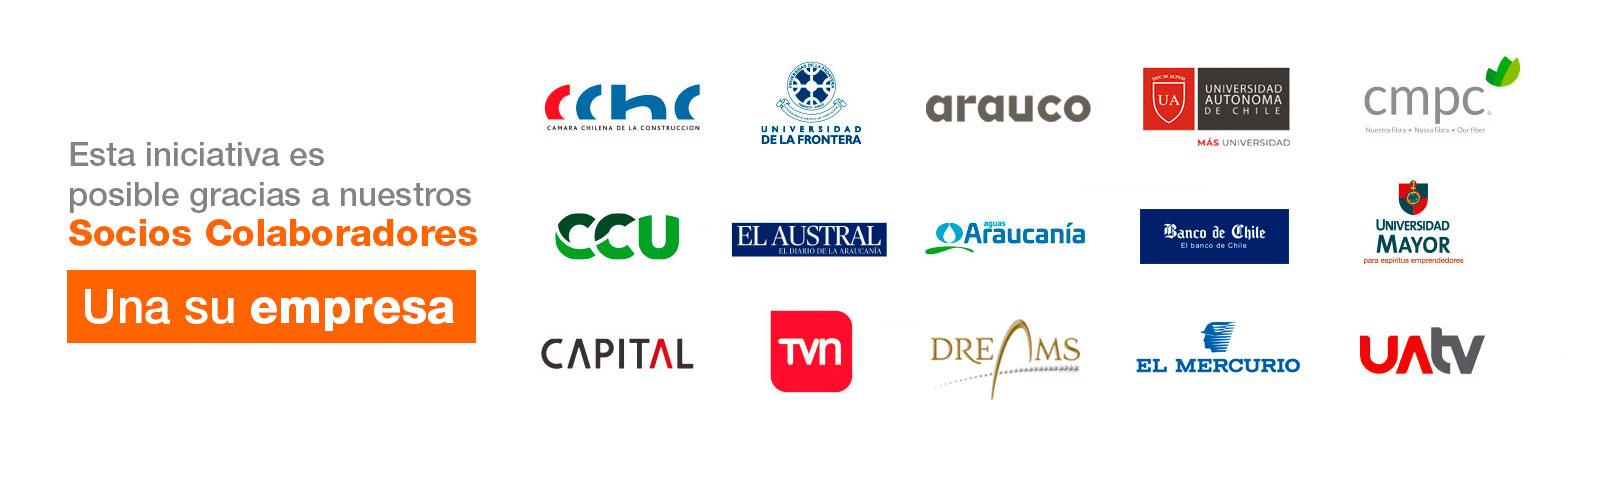 slider-logos-2020-reordenados